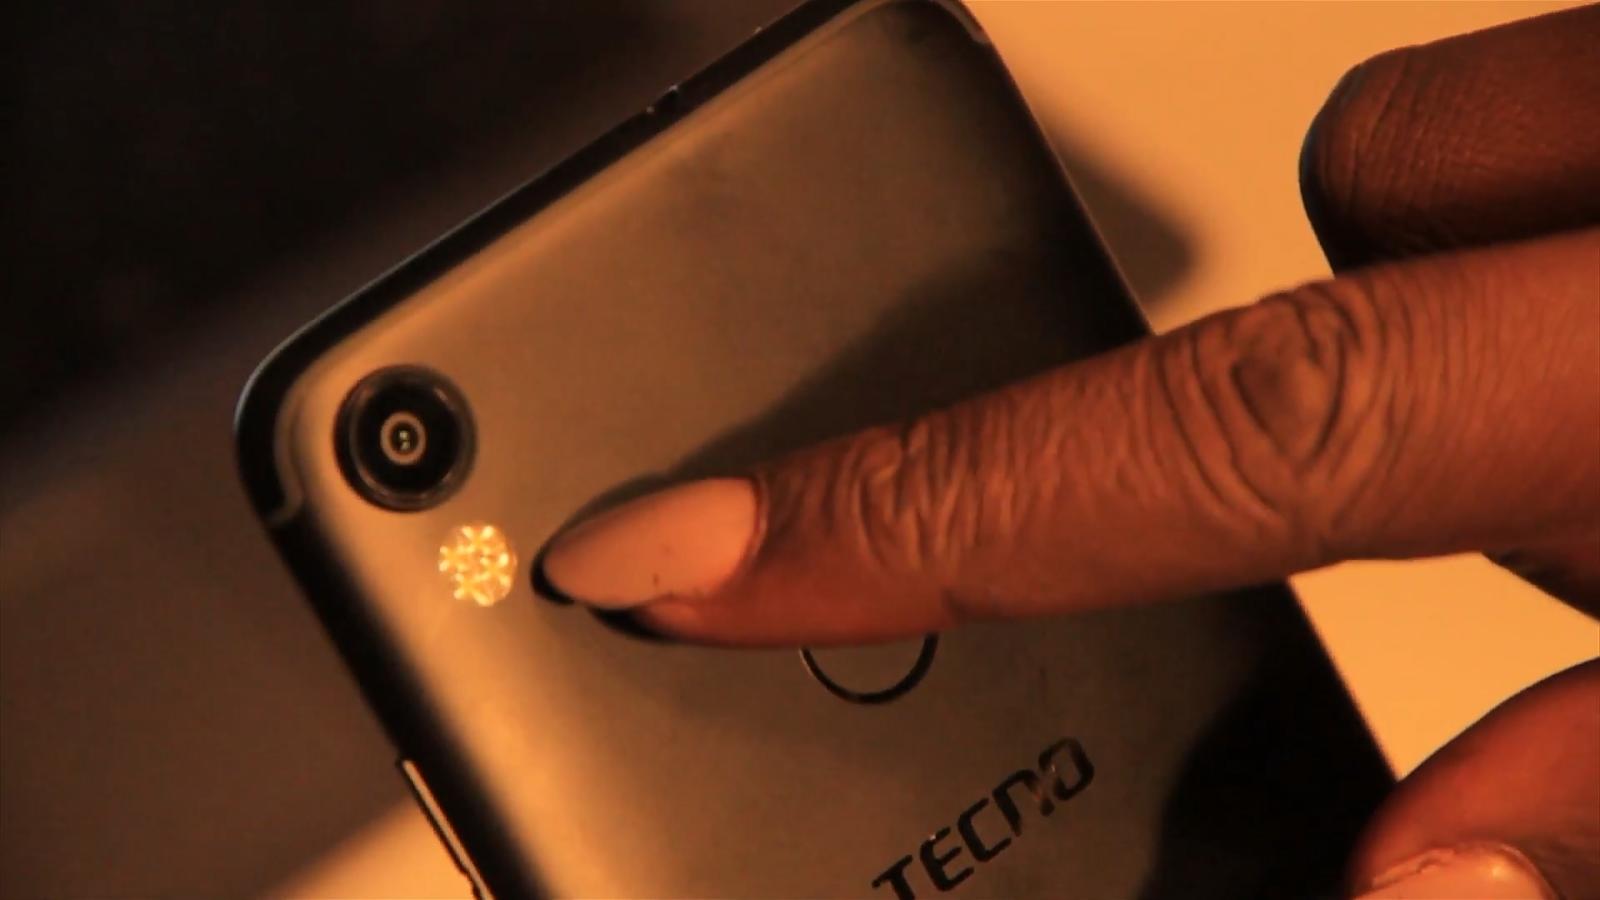 13mp camera with quad flash and fingerprint reader